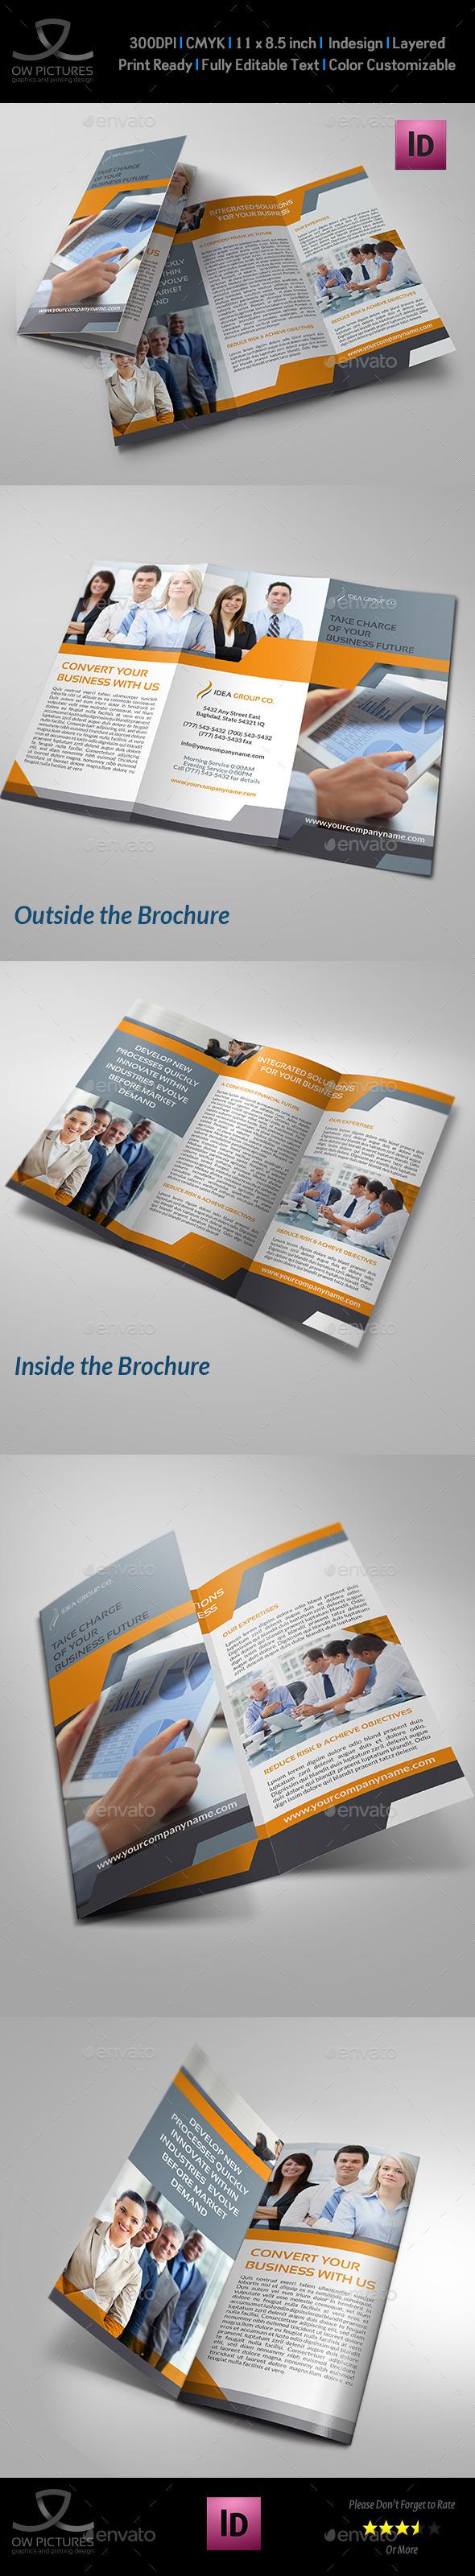 Company Brochure Tri-Fold Template Vol.16 - Corporate Brochures